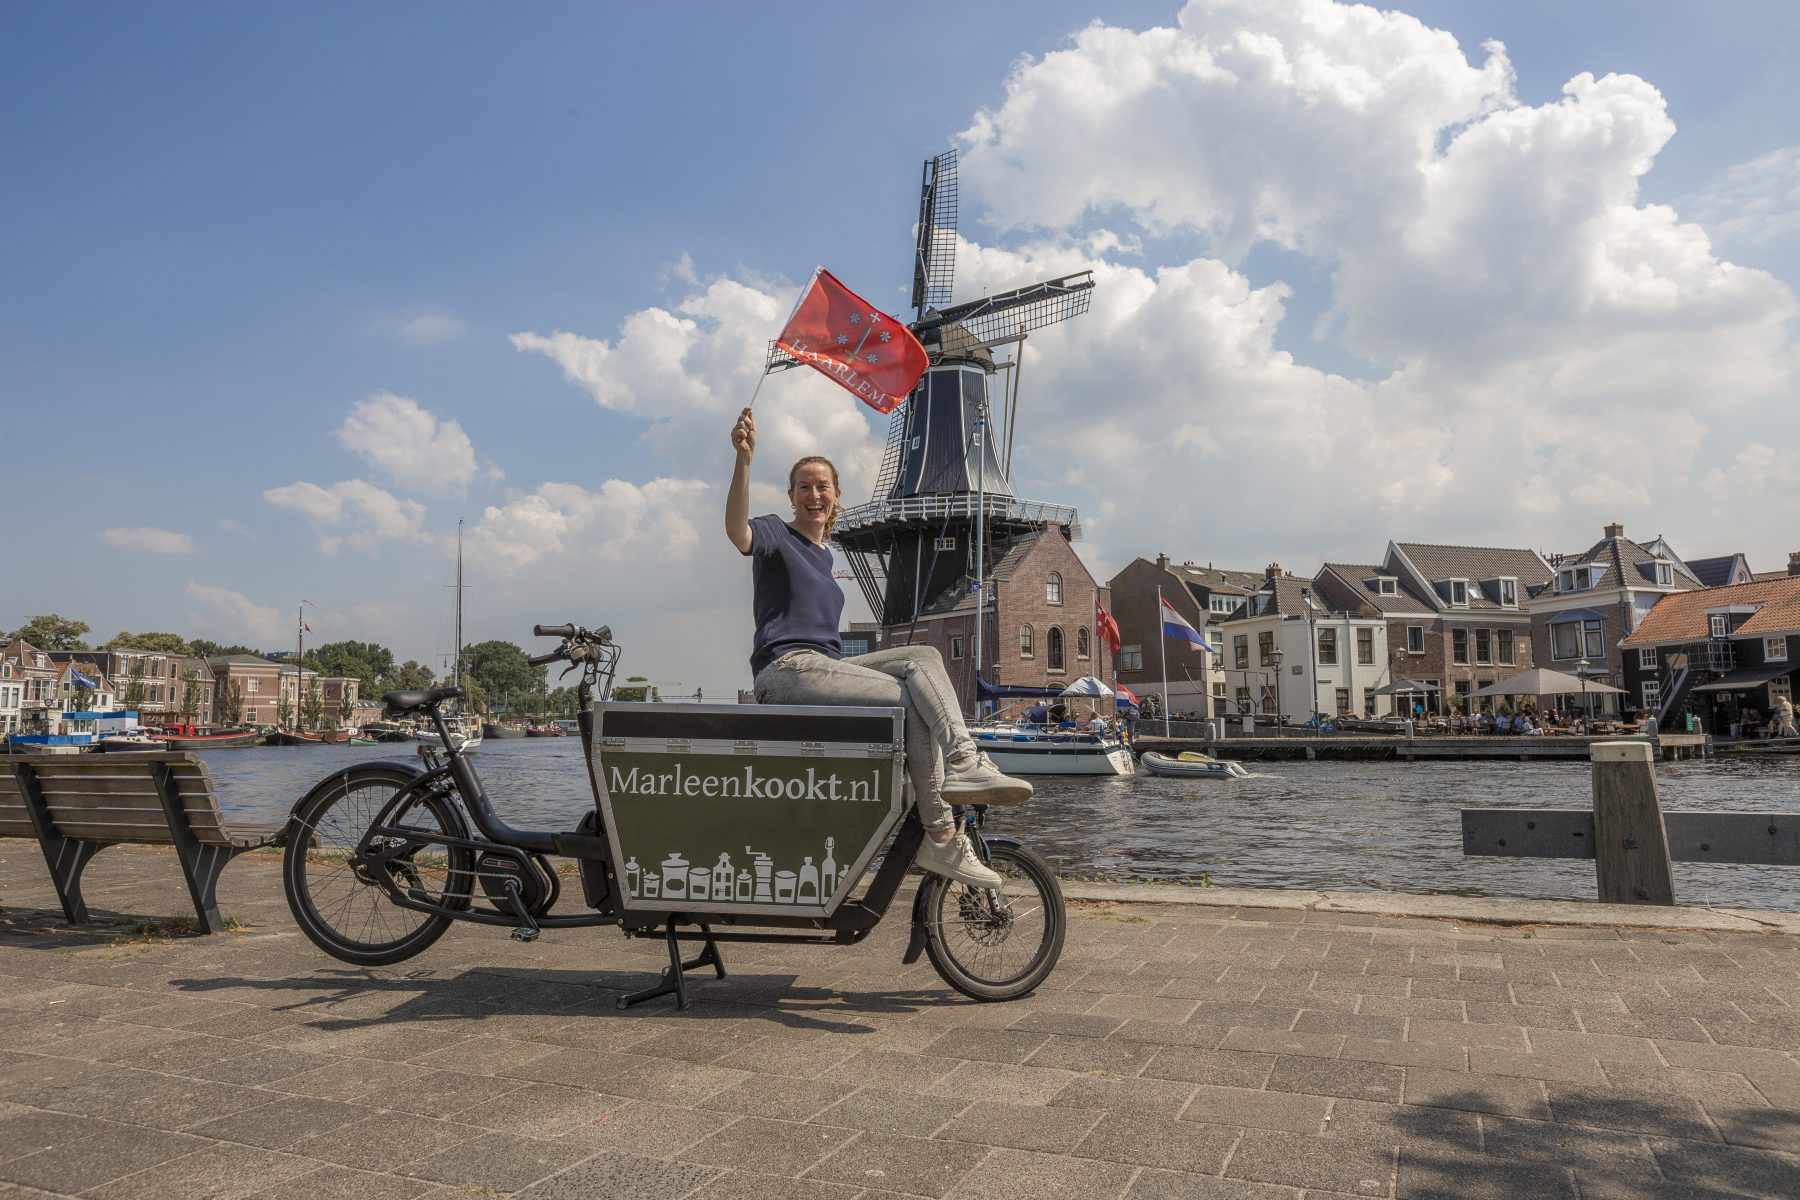 Marleenkookt Haarlem